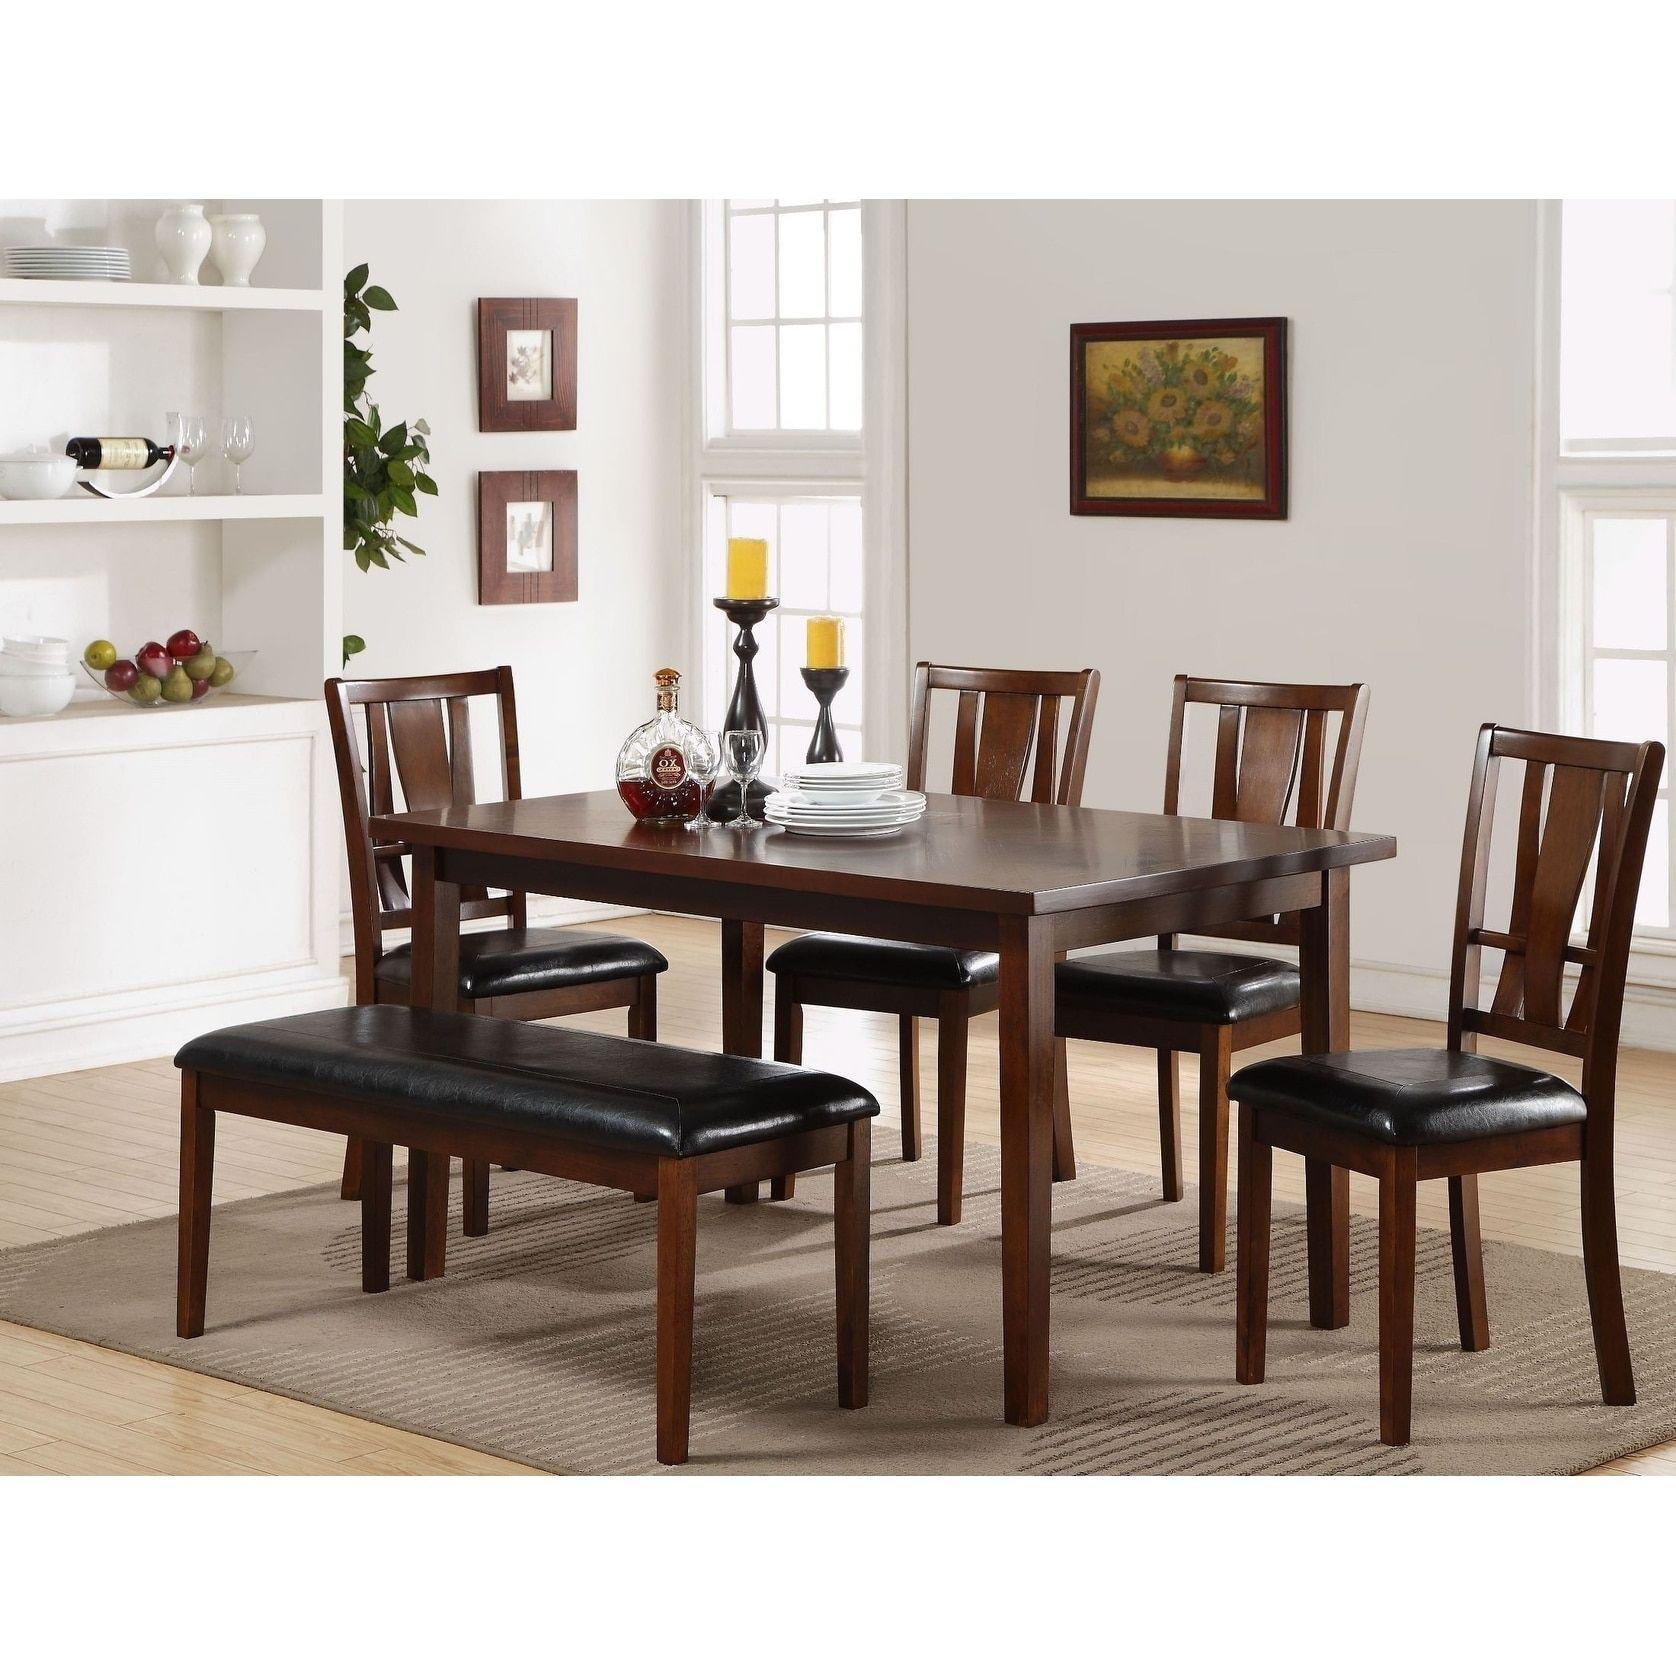 Strange Dixon Dark Espresso Standard Table 6 Piece Set Dining Black Creativecarmelina Interior Chair Design Creativecarmelinacom